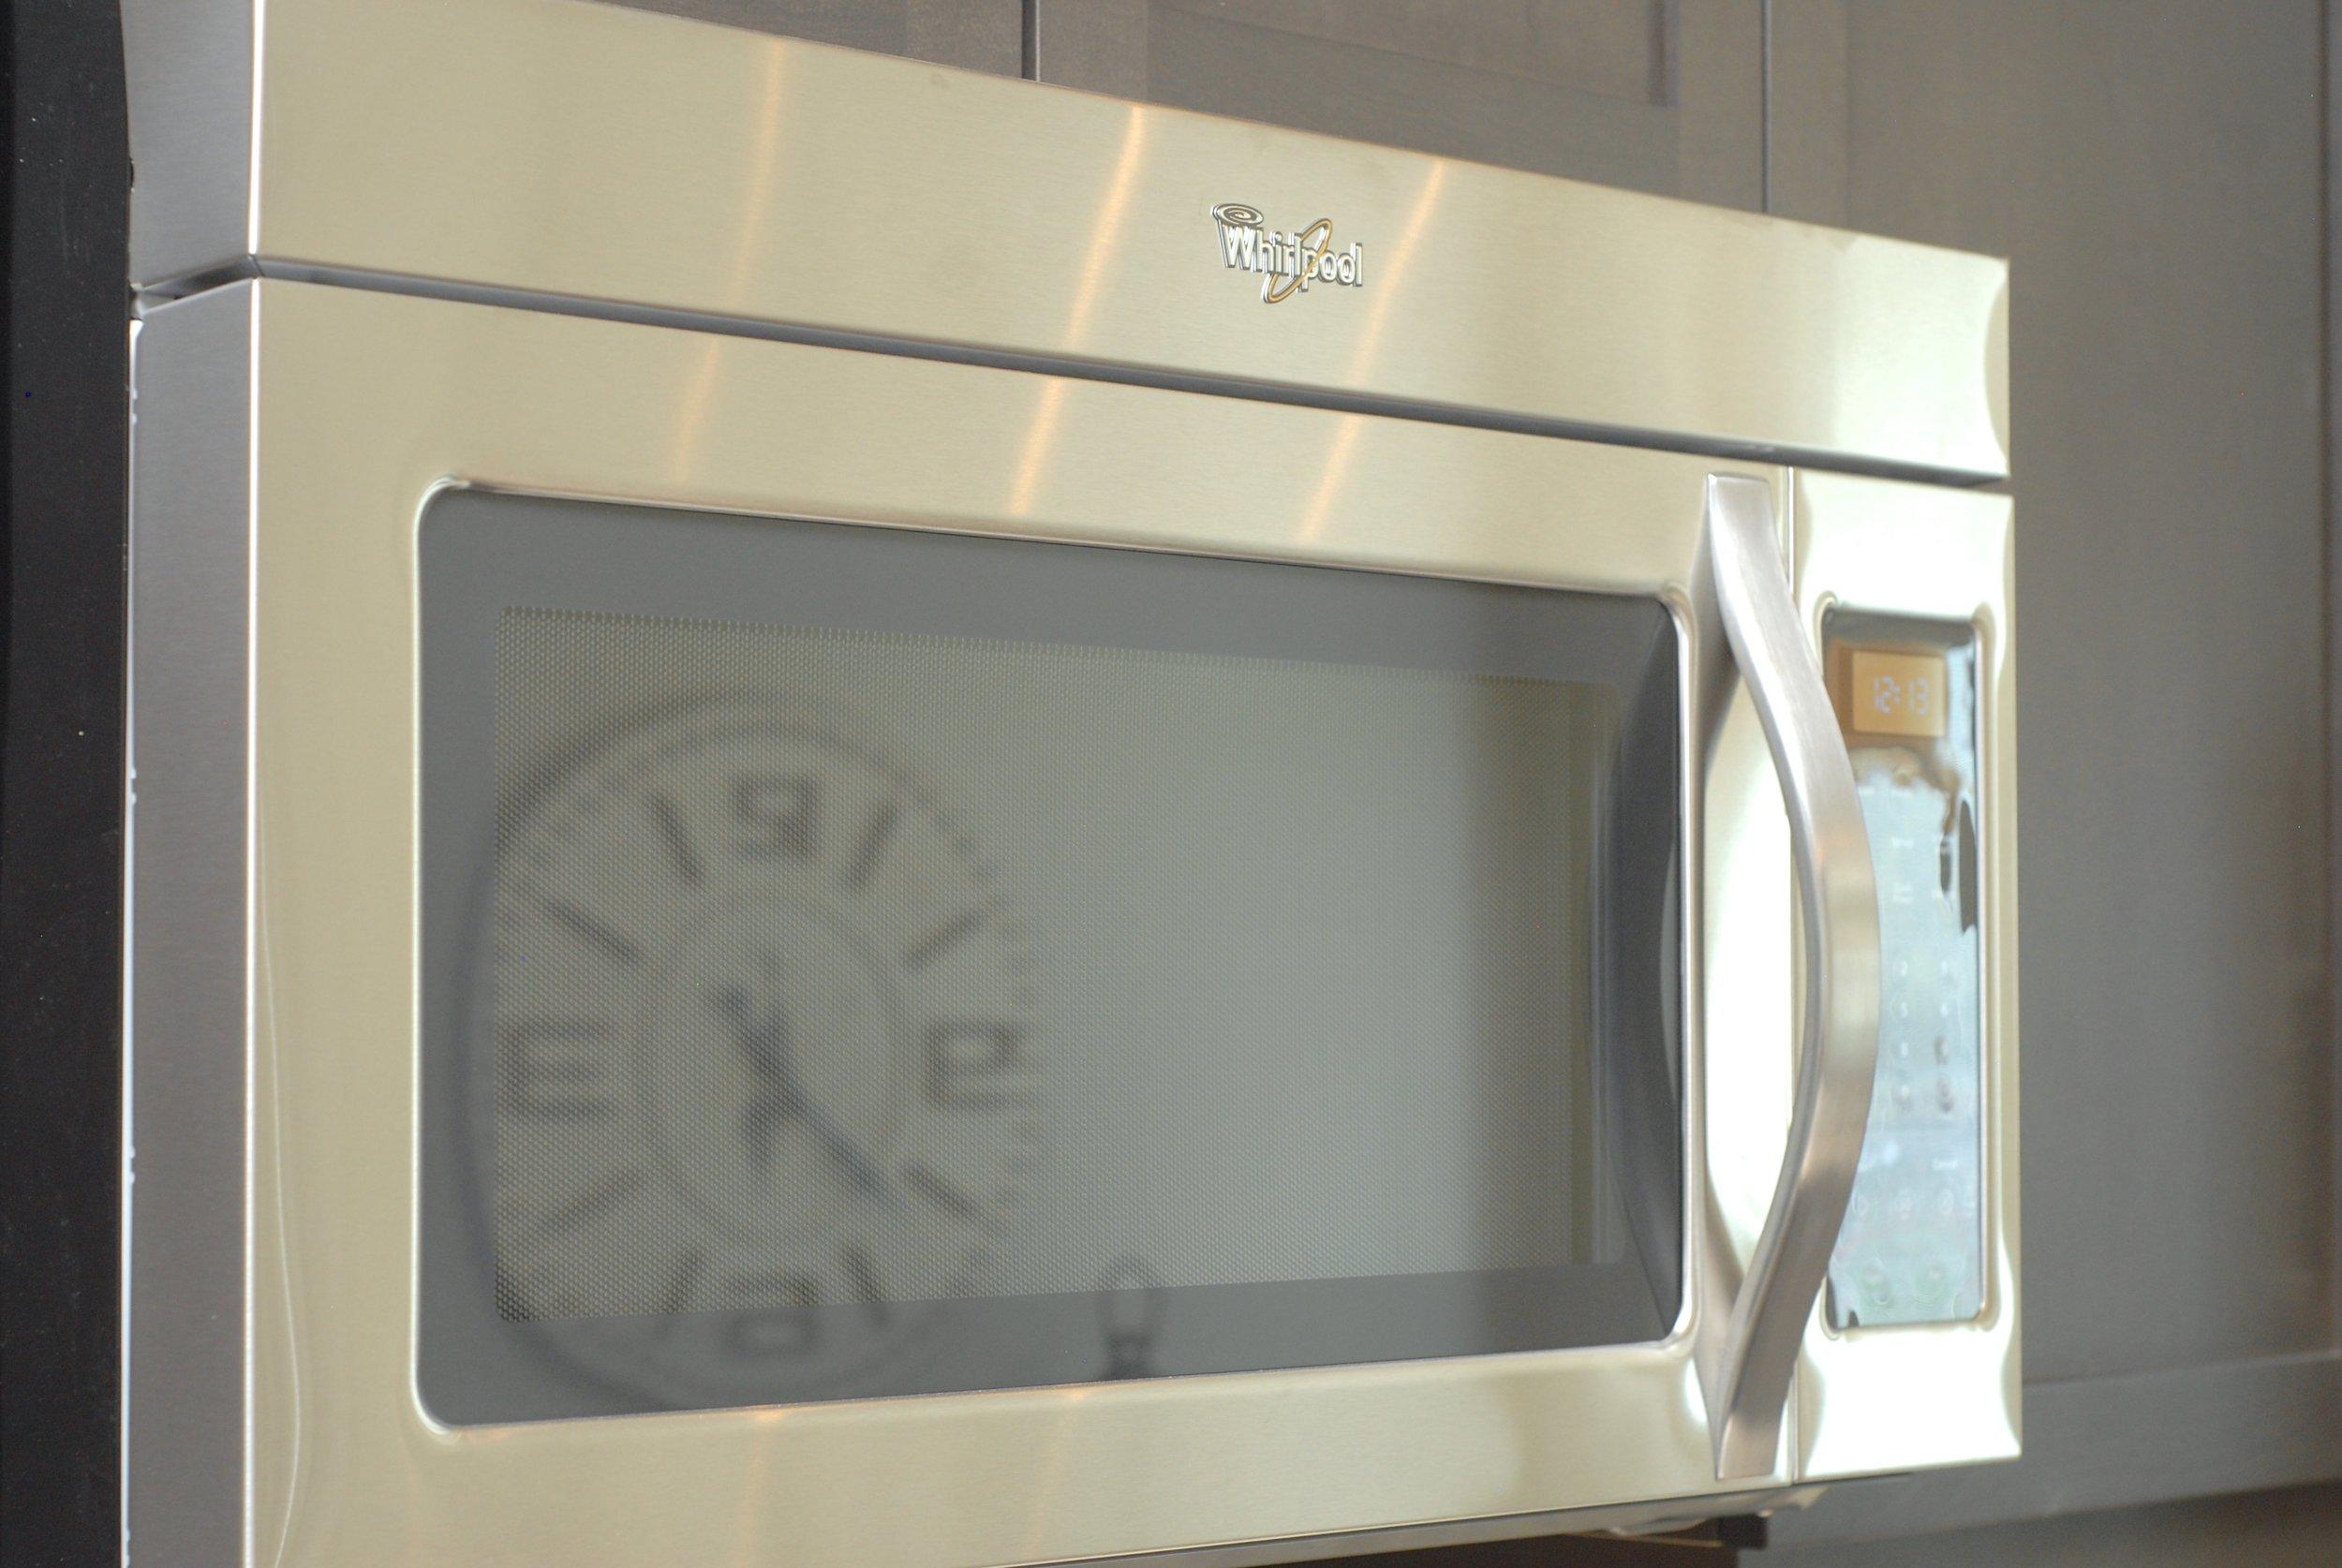 Whirlpool microwave hoodfan